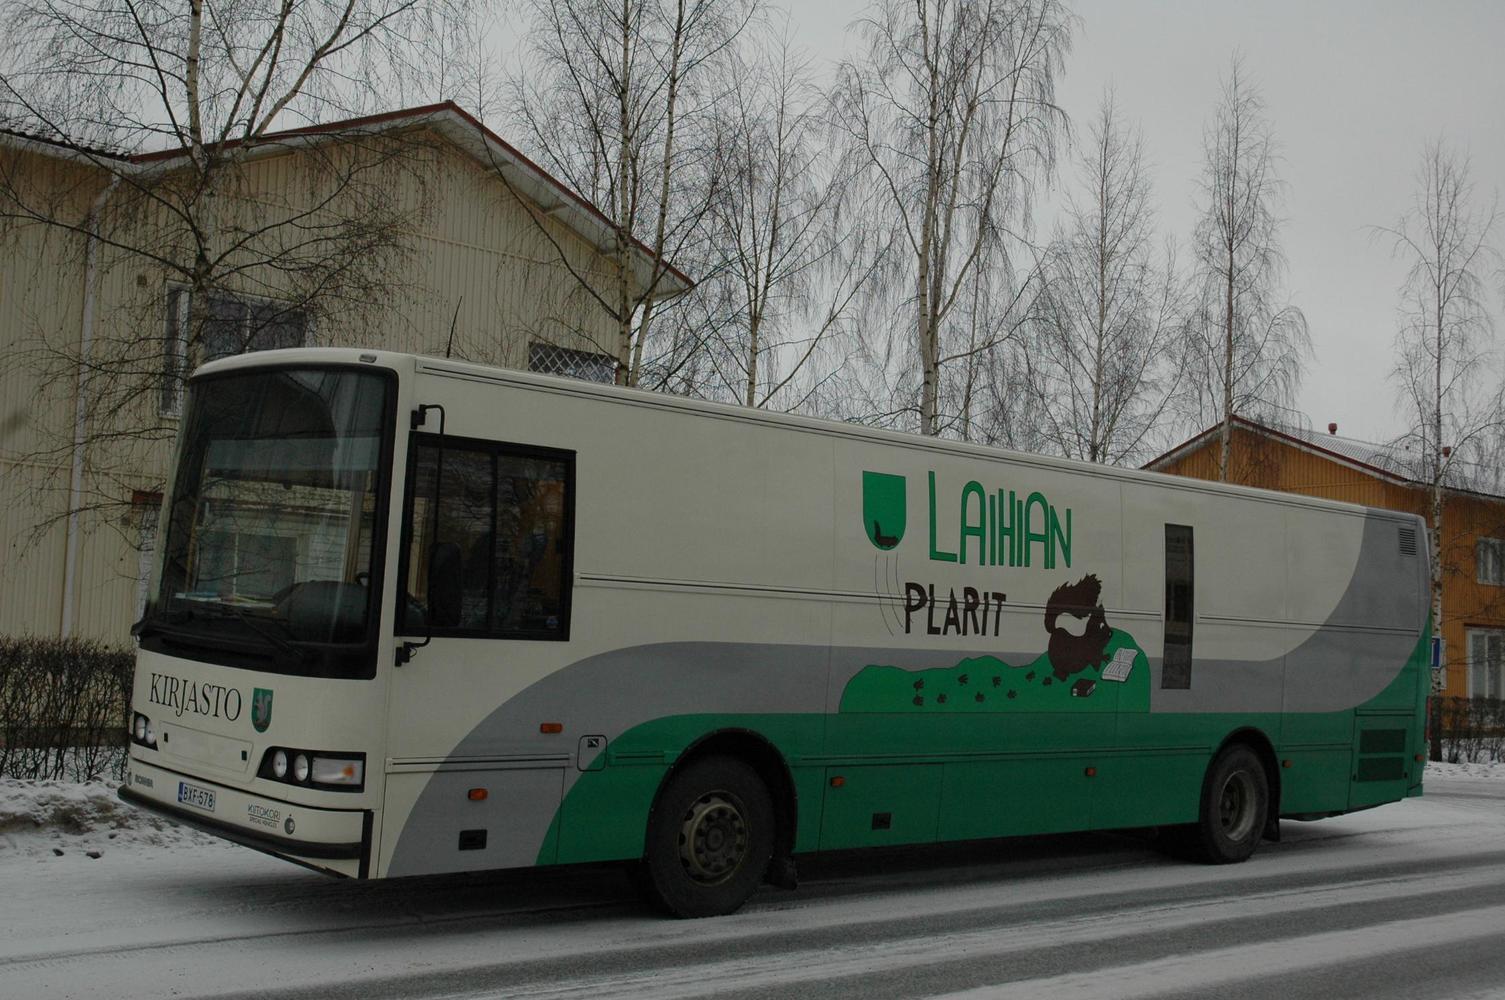 Bokbussen Plarit II (Laihela)